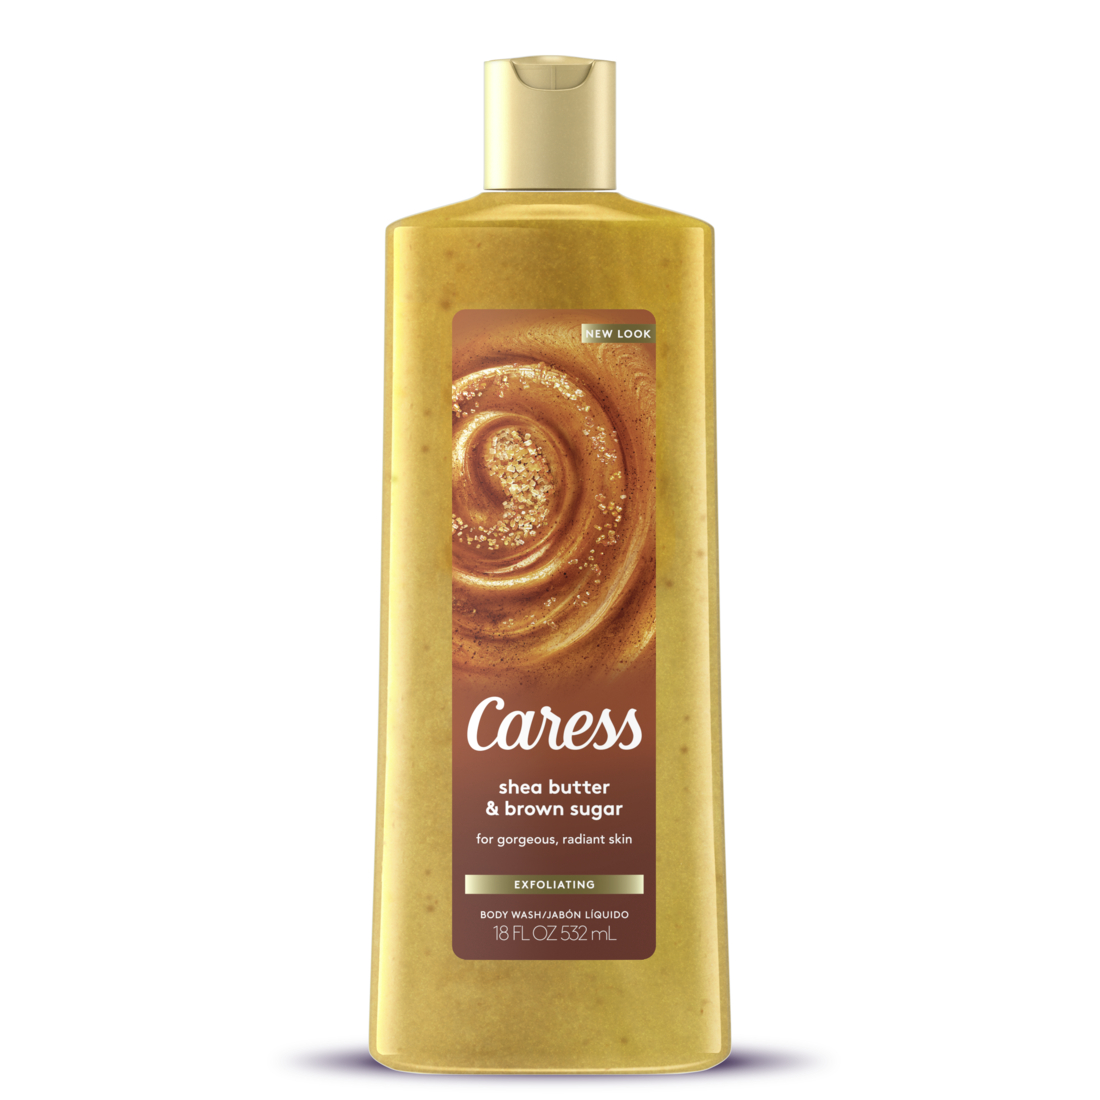 Caress Shea Butter & Brown Sugar body wash